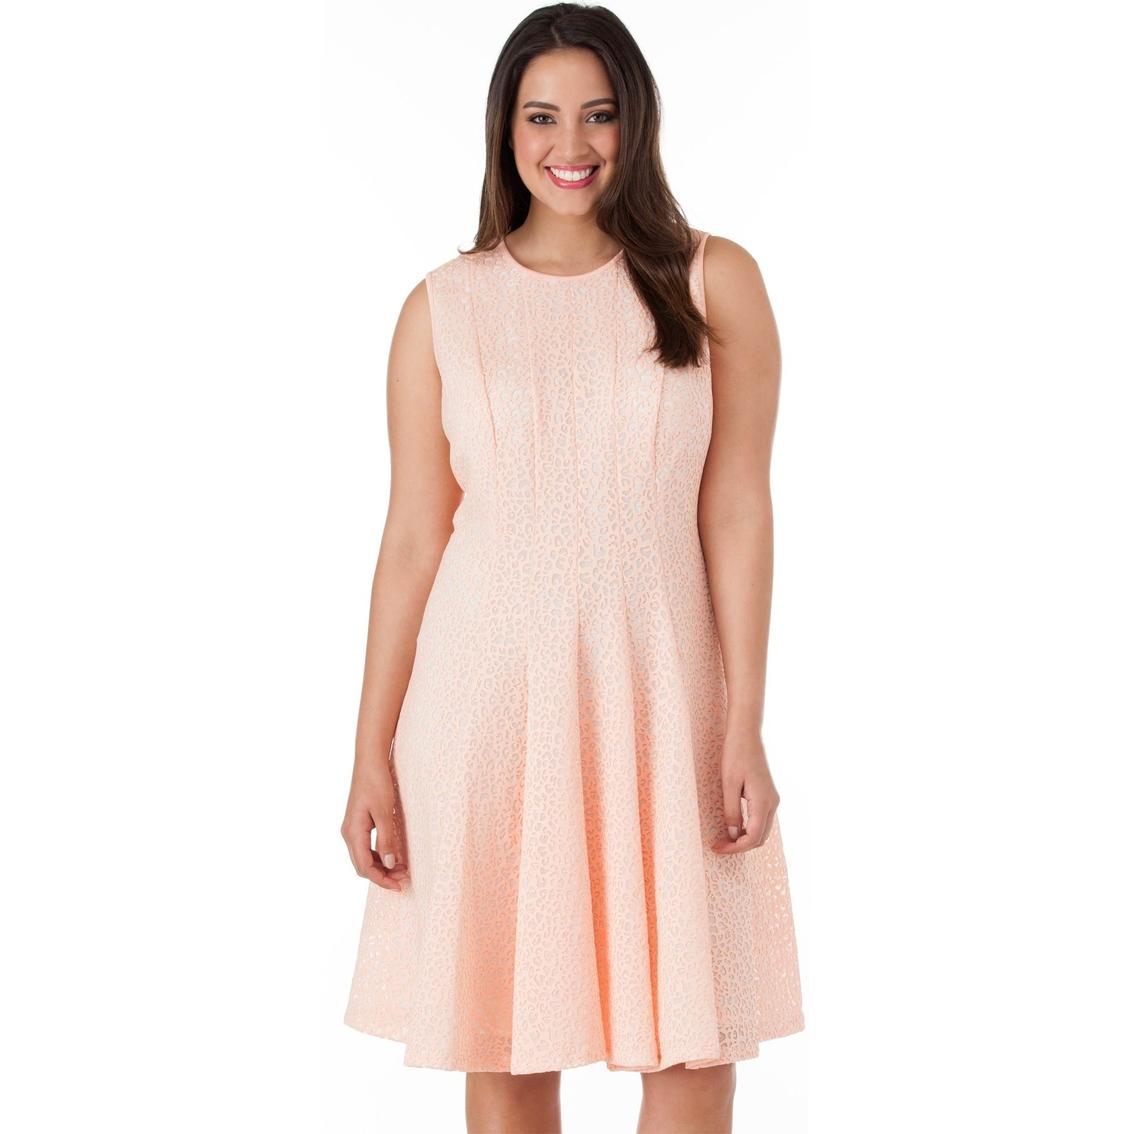 21e4660b250 Calvin Klein Plus Size Laser Cut Flare Dress